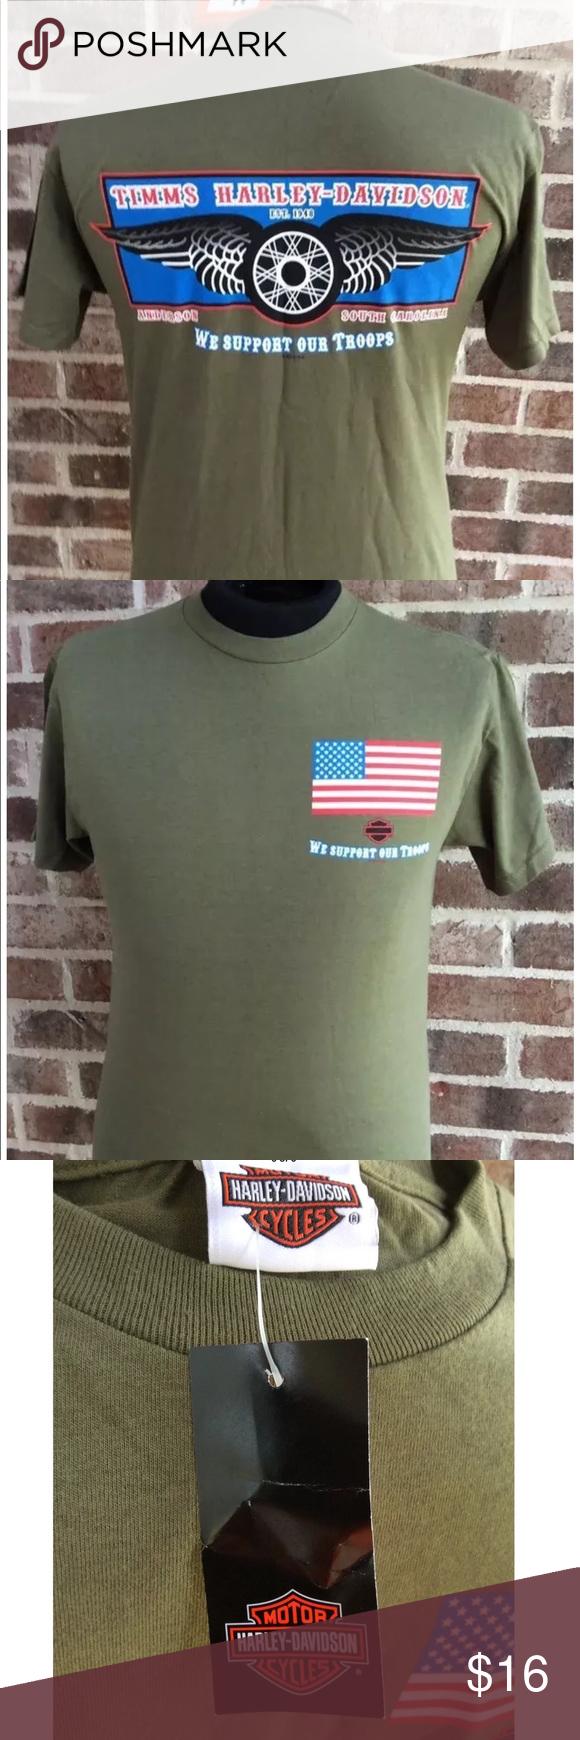 Mens Harley Davidson Military Appreciation Tshirt Nwt Appreciation